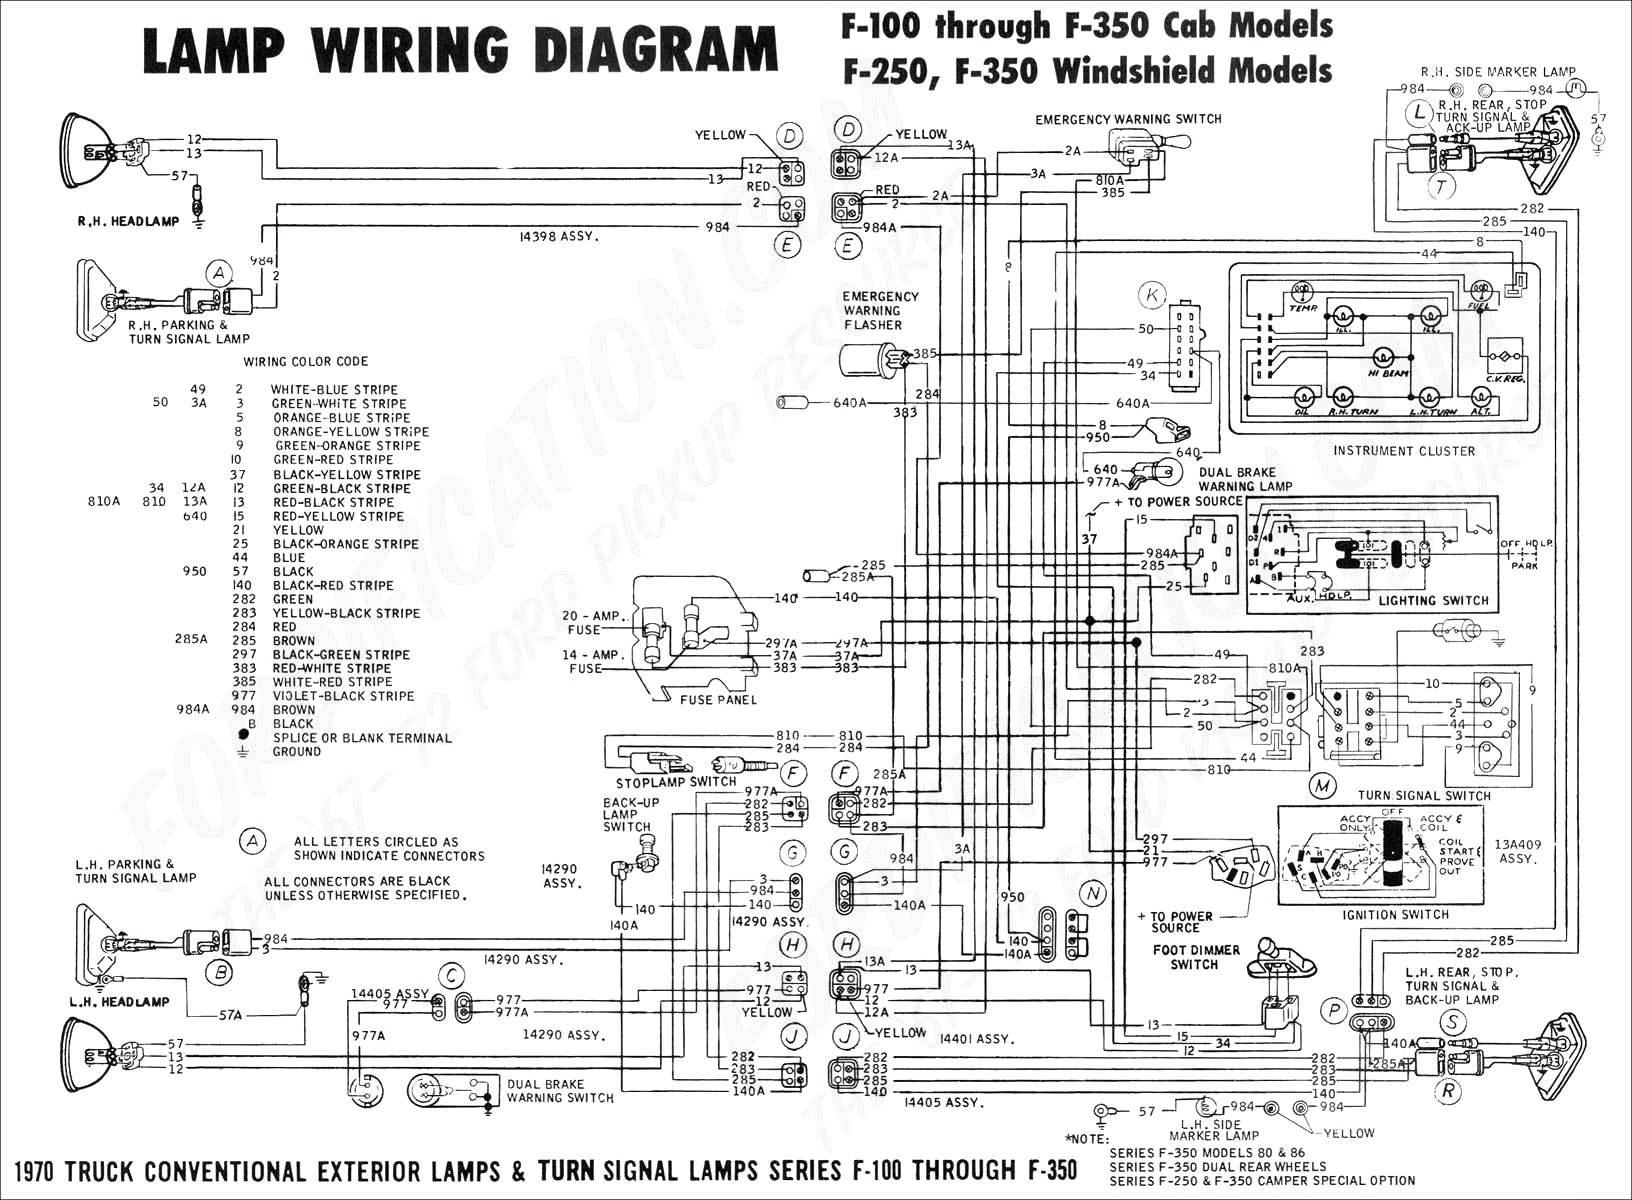 7.3 Glow Plug Controller Diagram Kr 7628] ford 7 3 Glow Plug Relay Wiring Diagram Moreover 7 Of 7.3 Glow Plug Controller Diagram